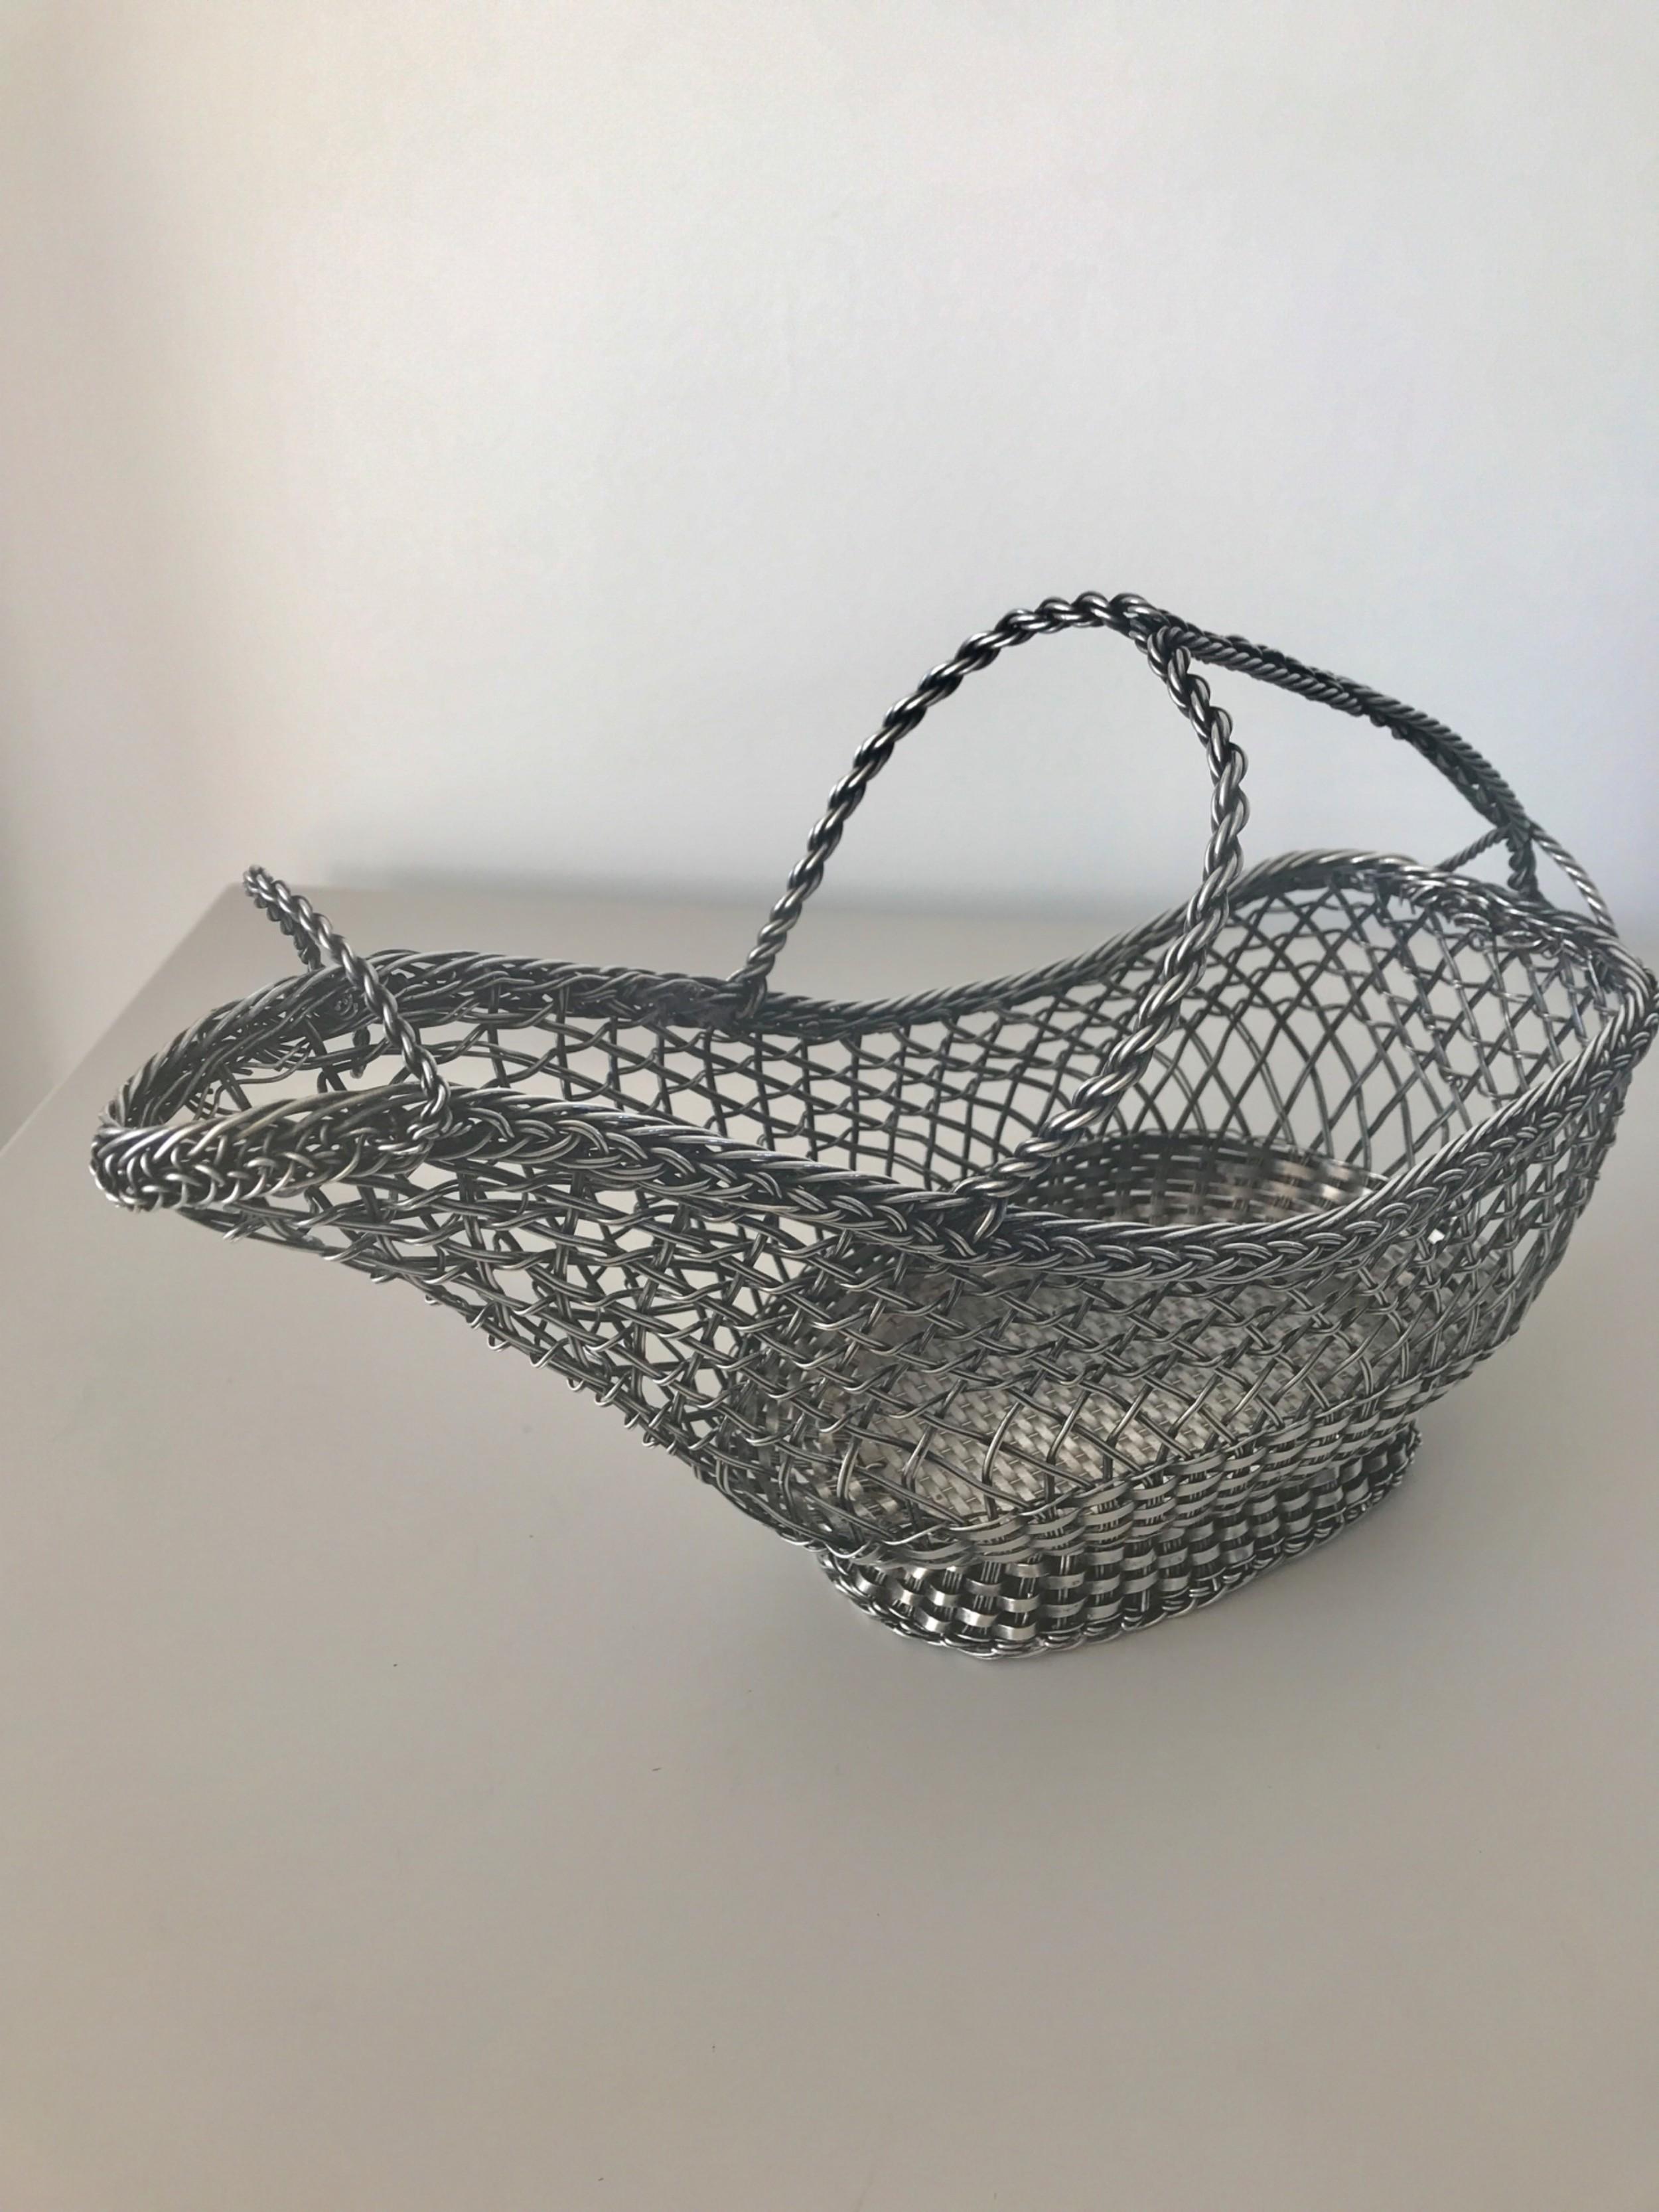 silver plated wine bottle basket